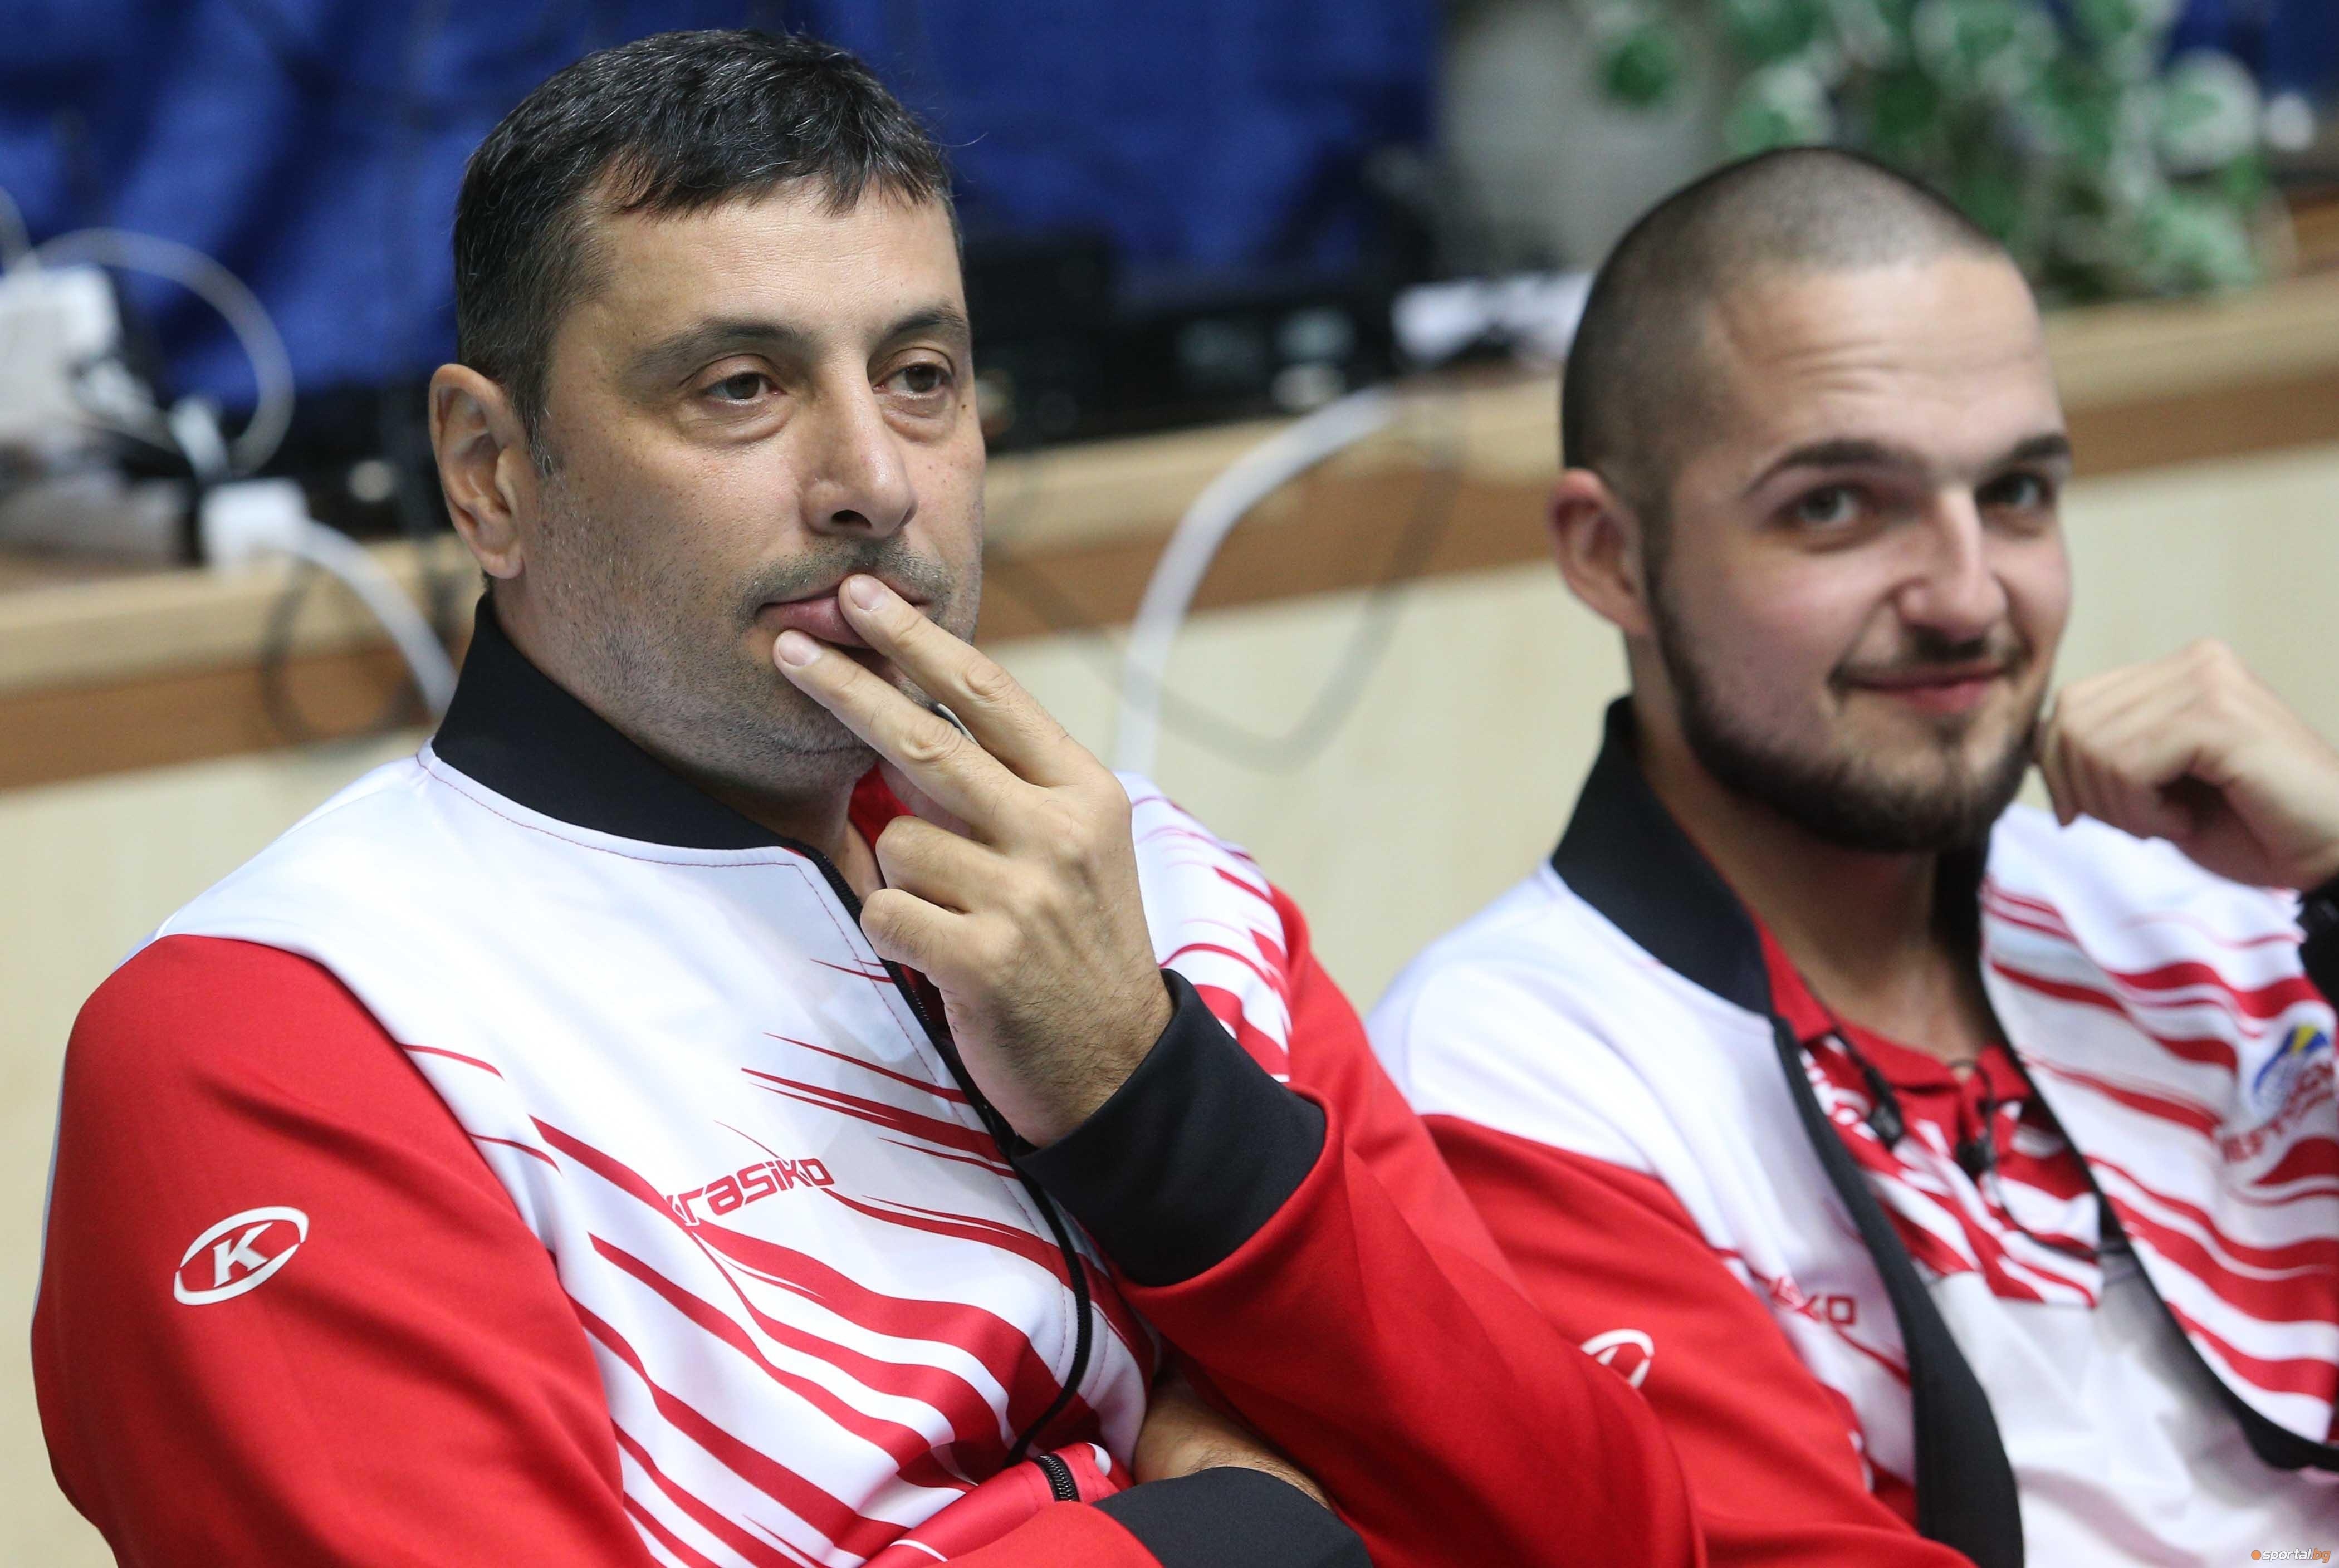 Старши треньорът на Нефтохимик 2010 (Бургас) Николай Желязков говори пред